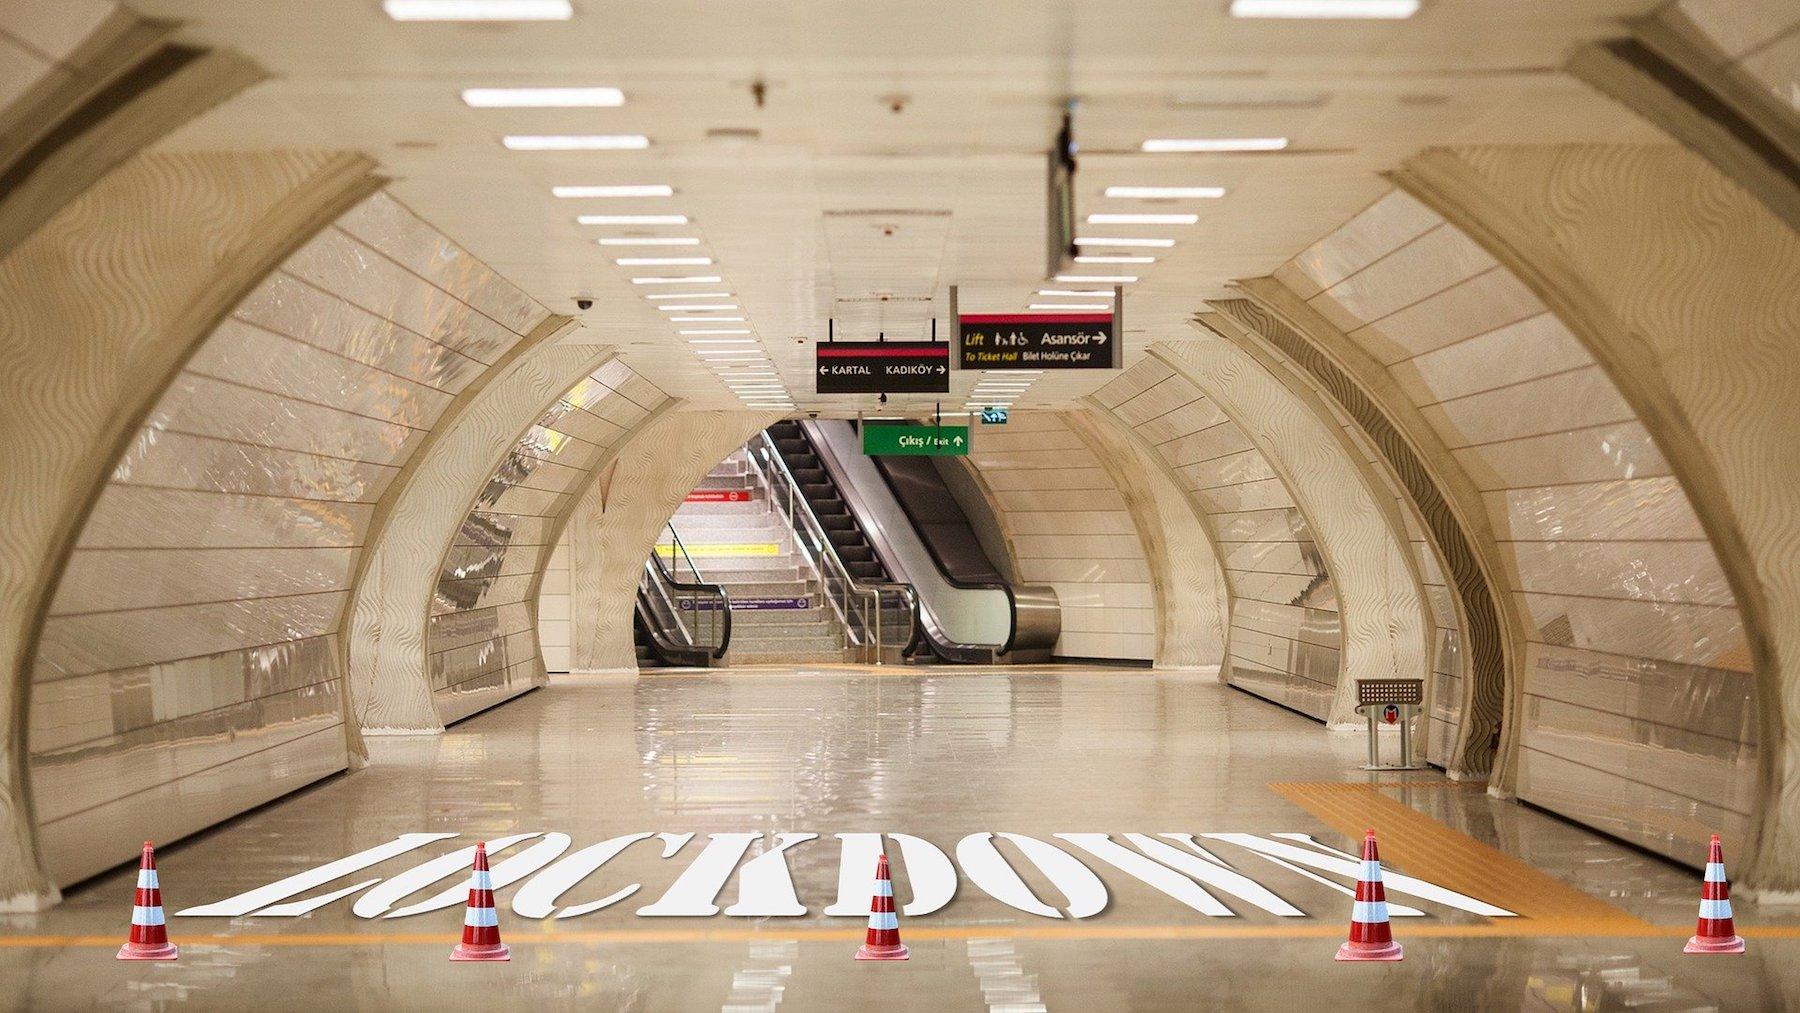 subway-5032537 1920